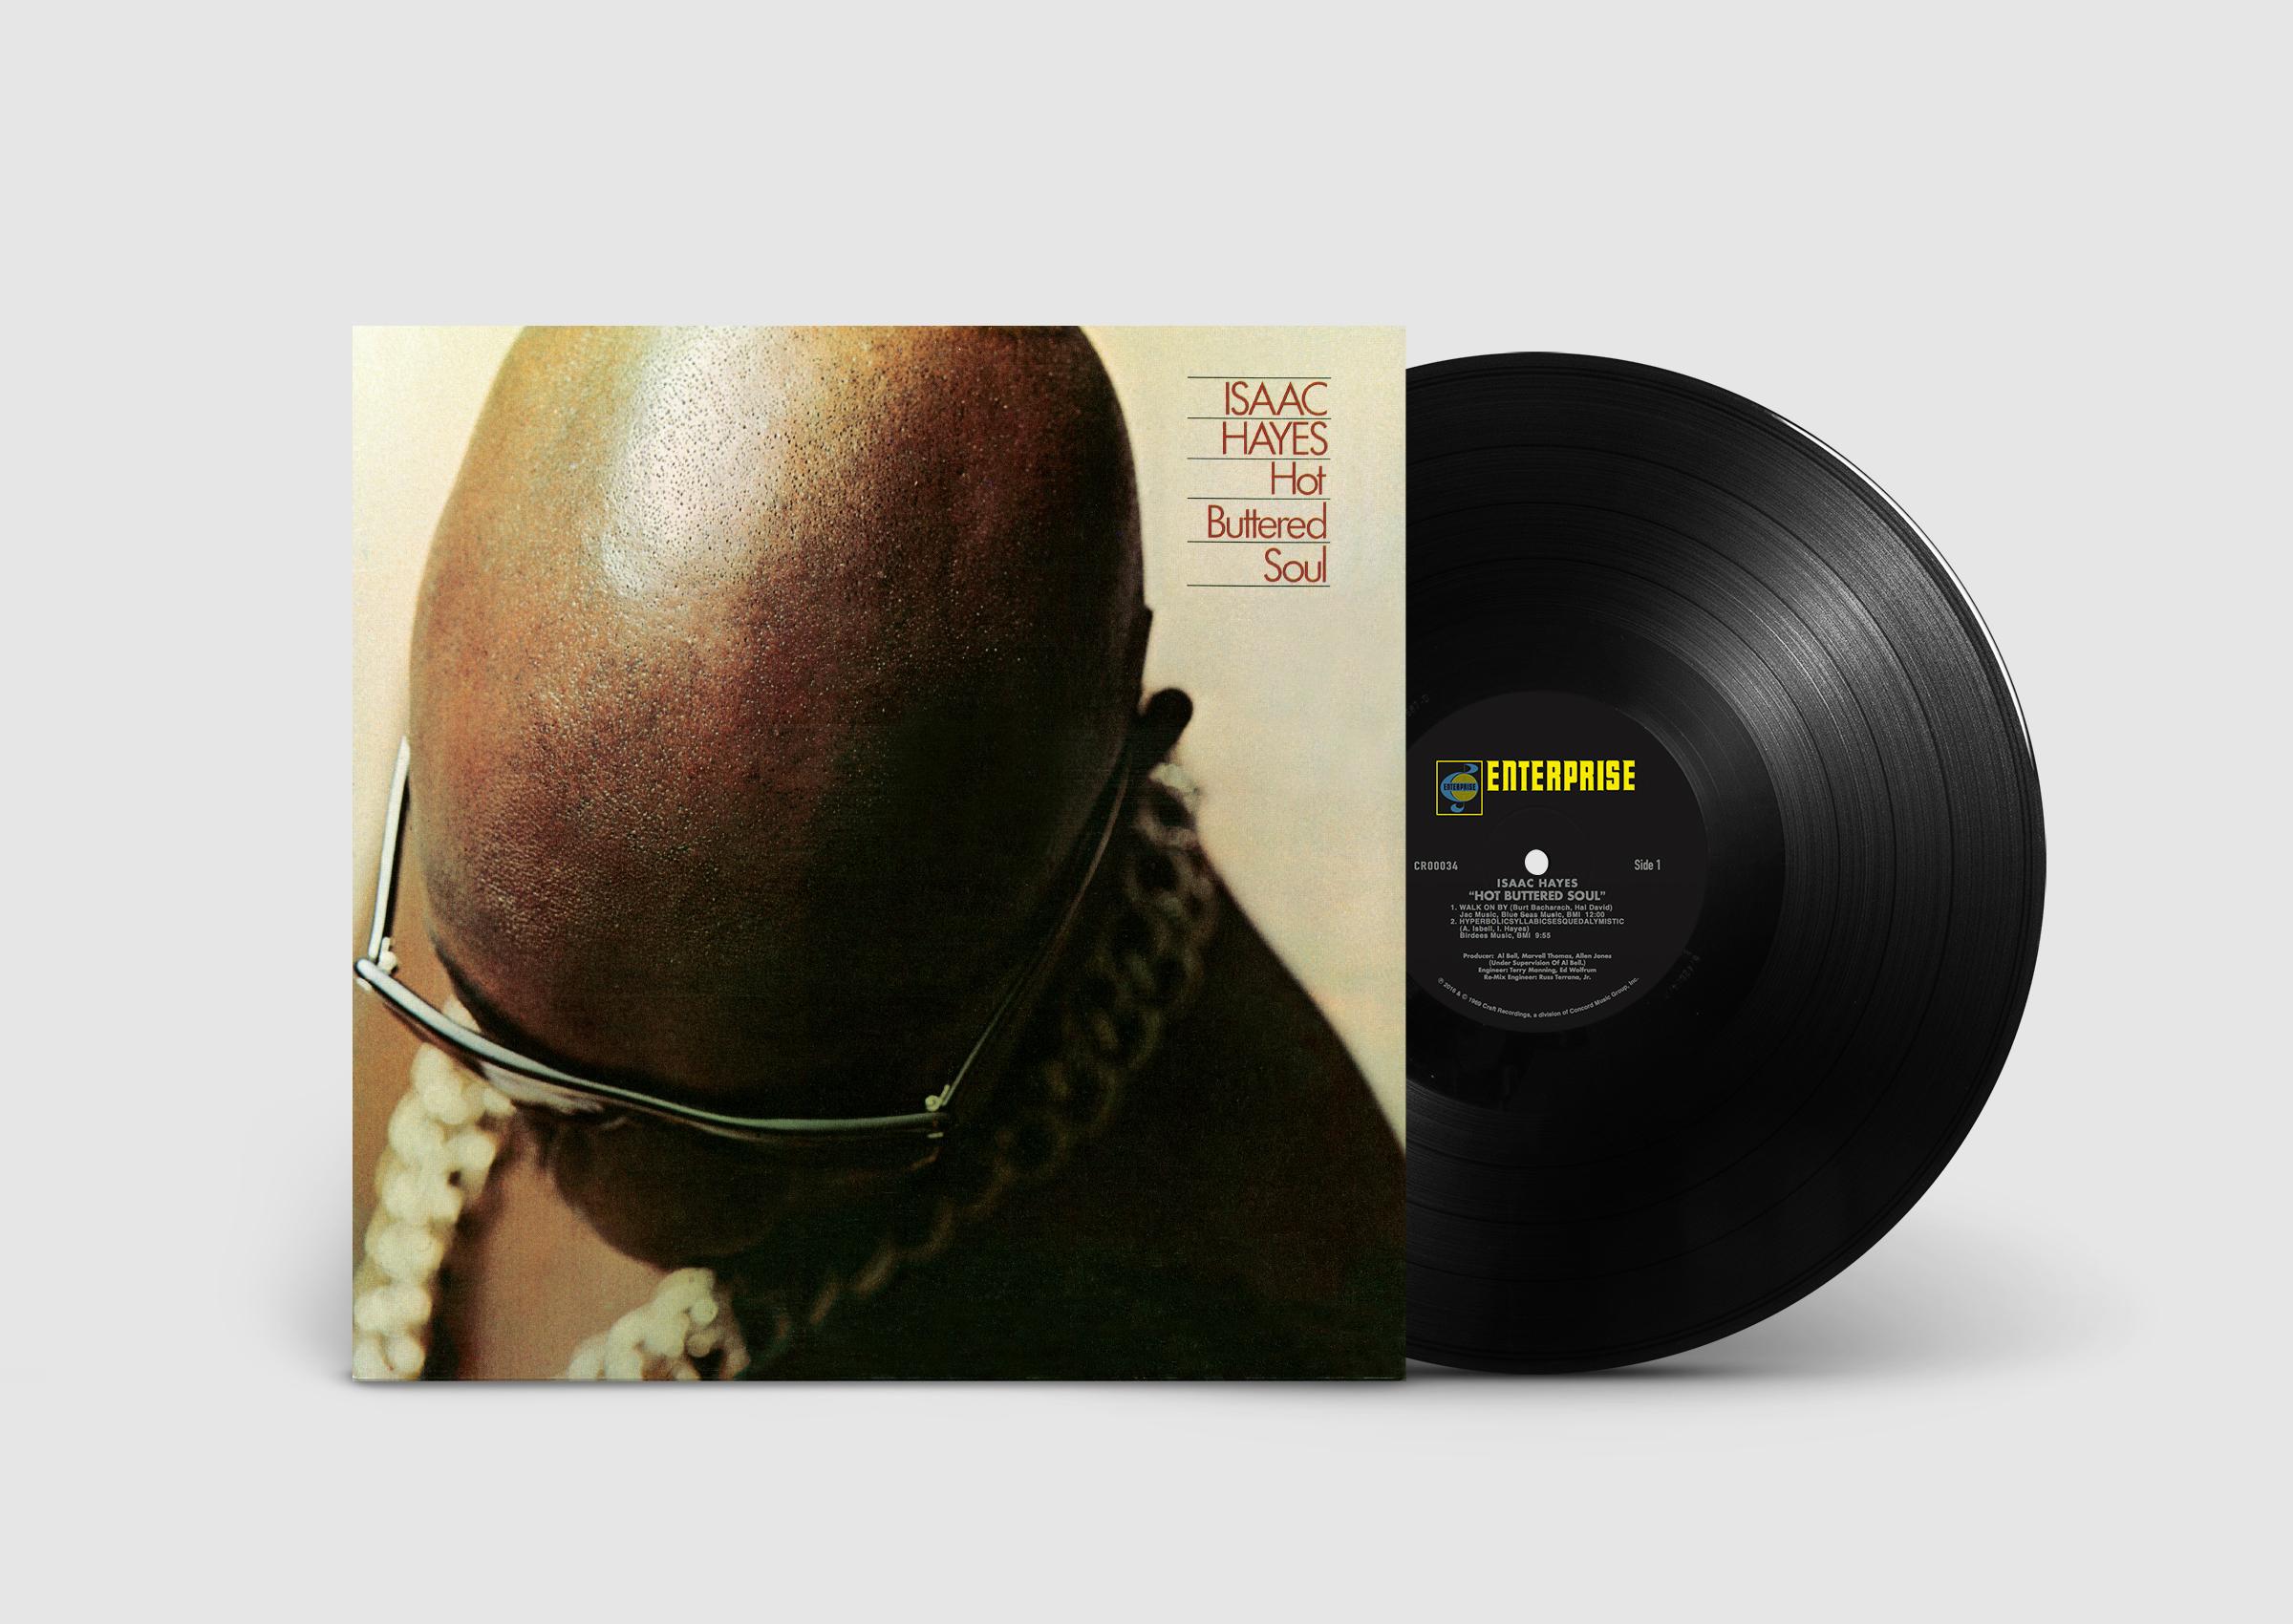 Three landmark Isaac Hayes albums reissued on vinyl